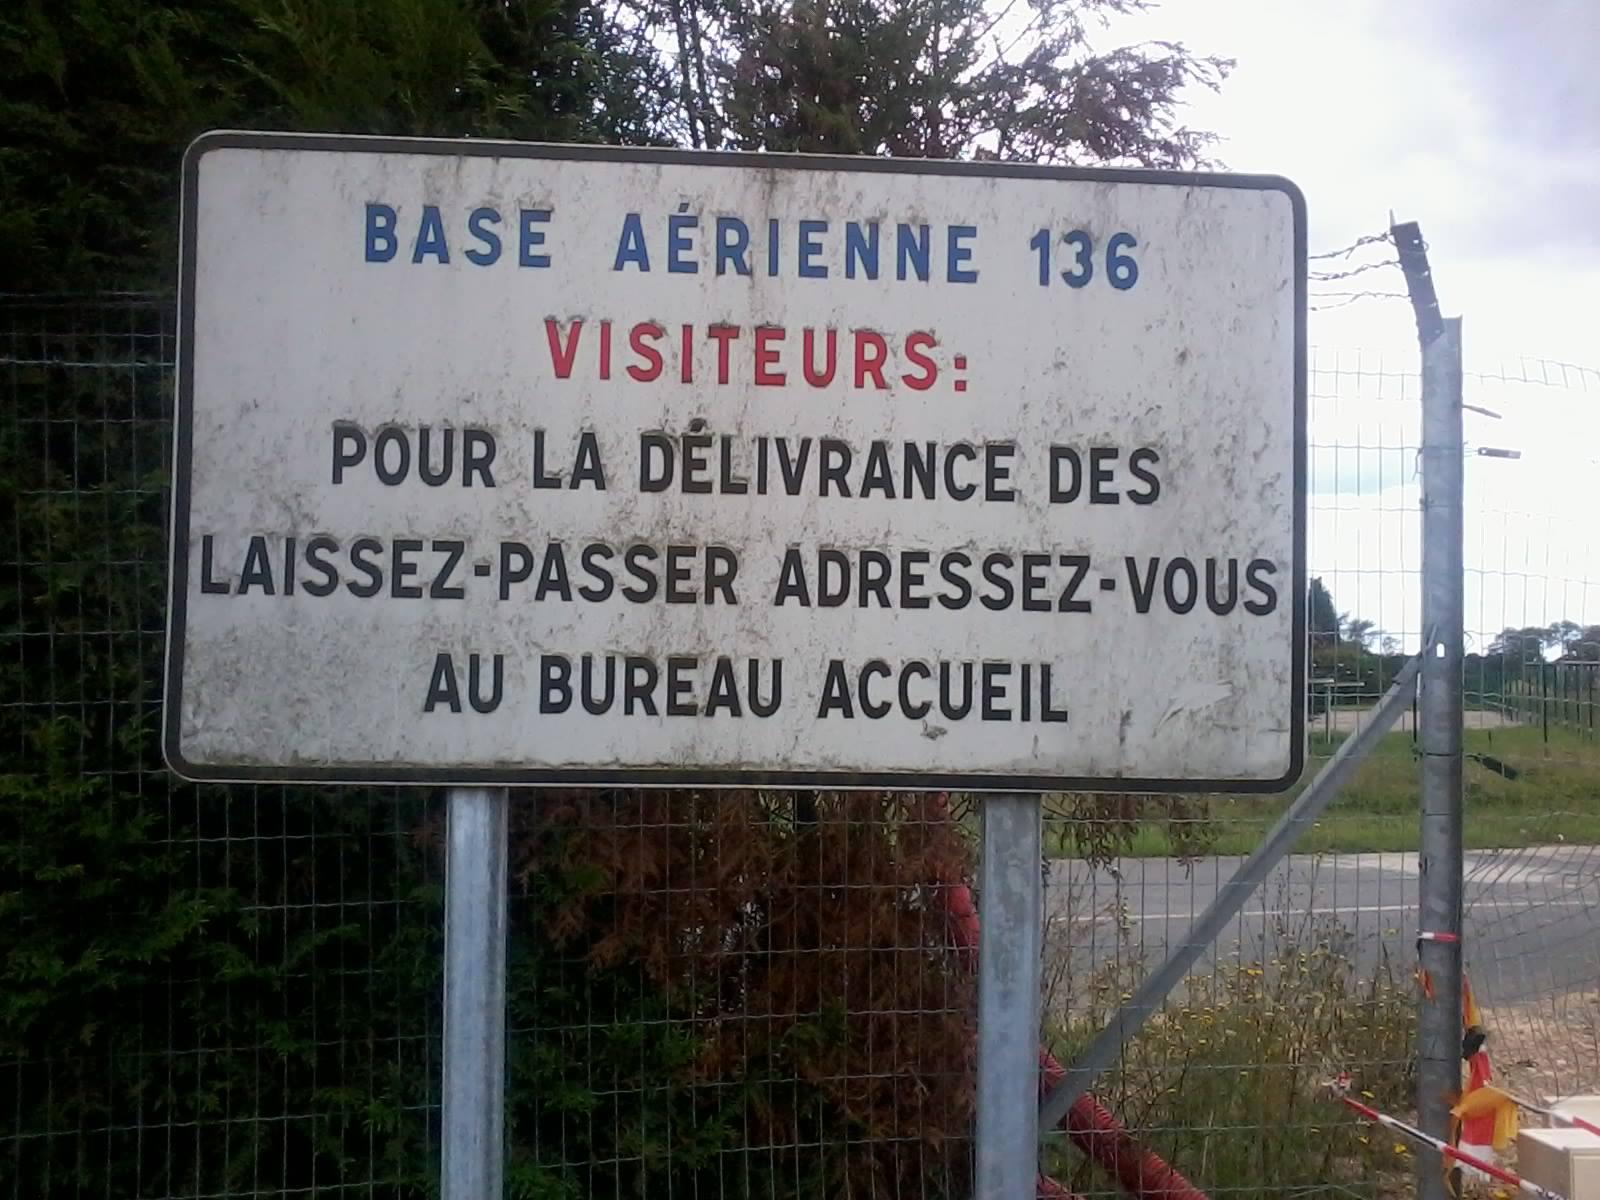 BA 136